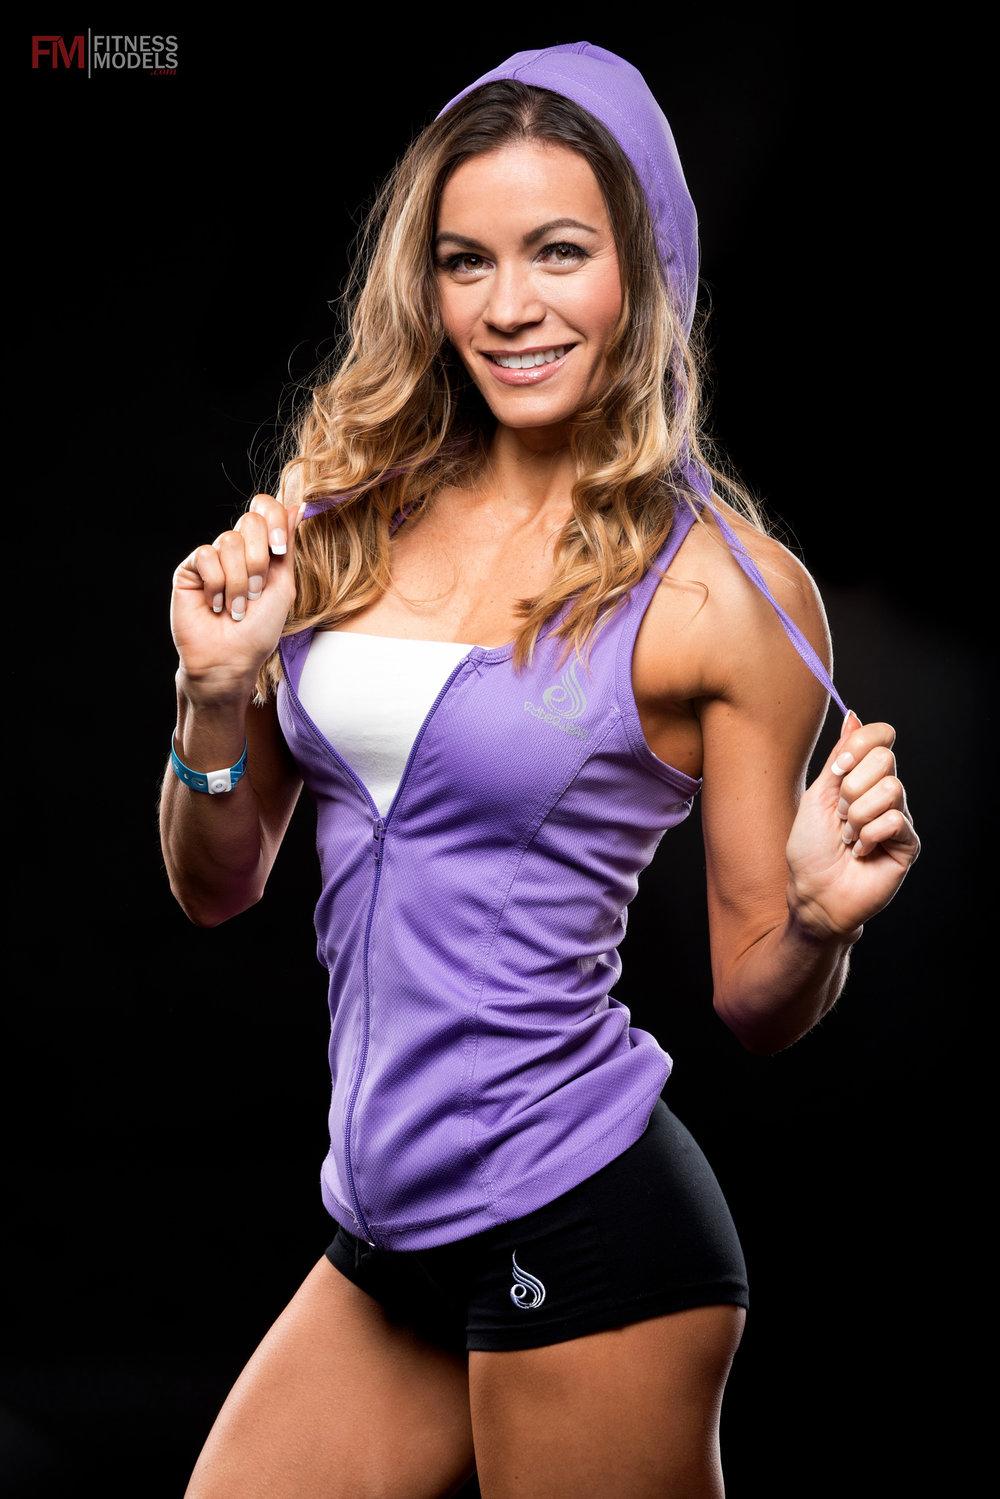 Nicole-Tovey-Image-10.jpg